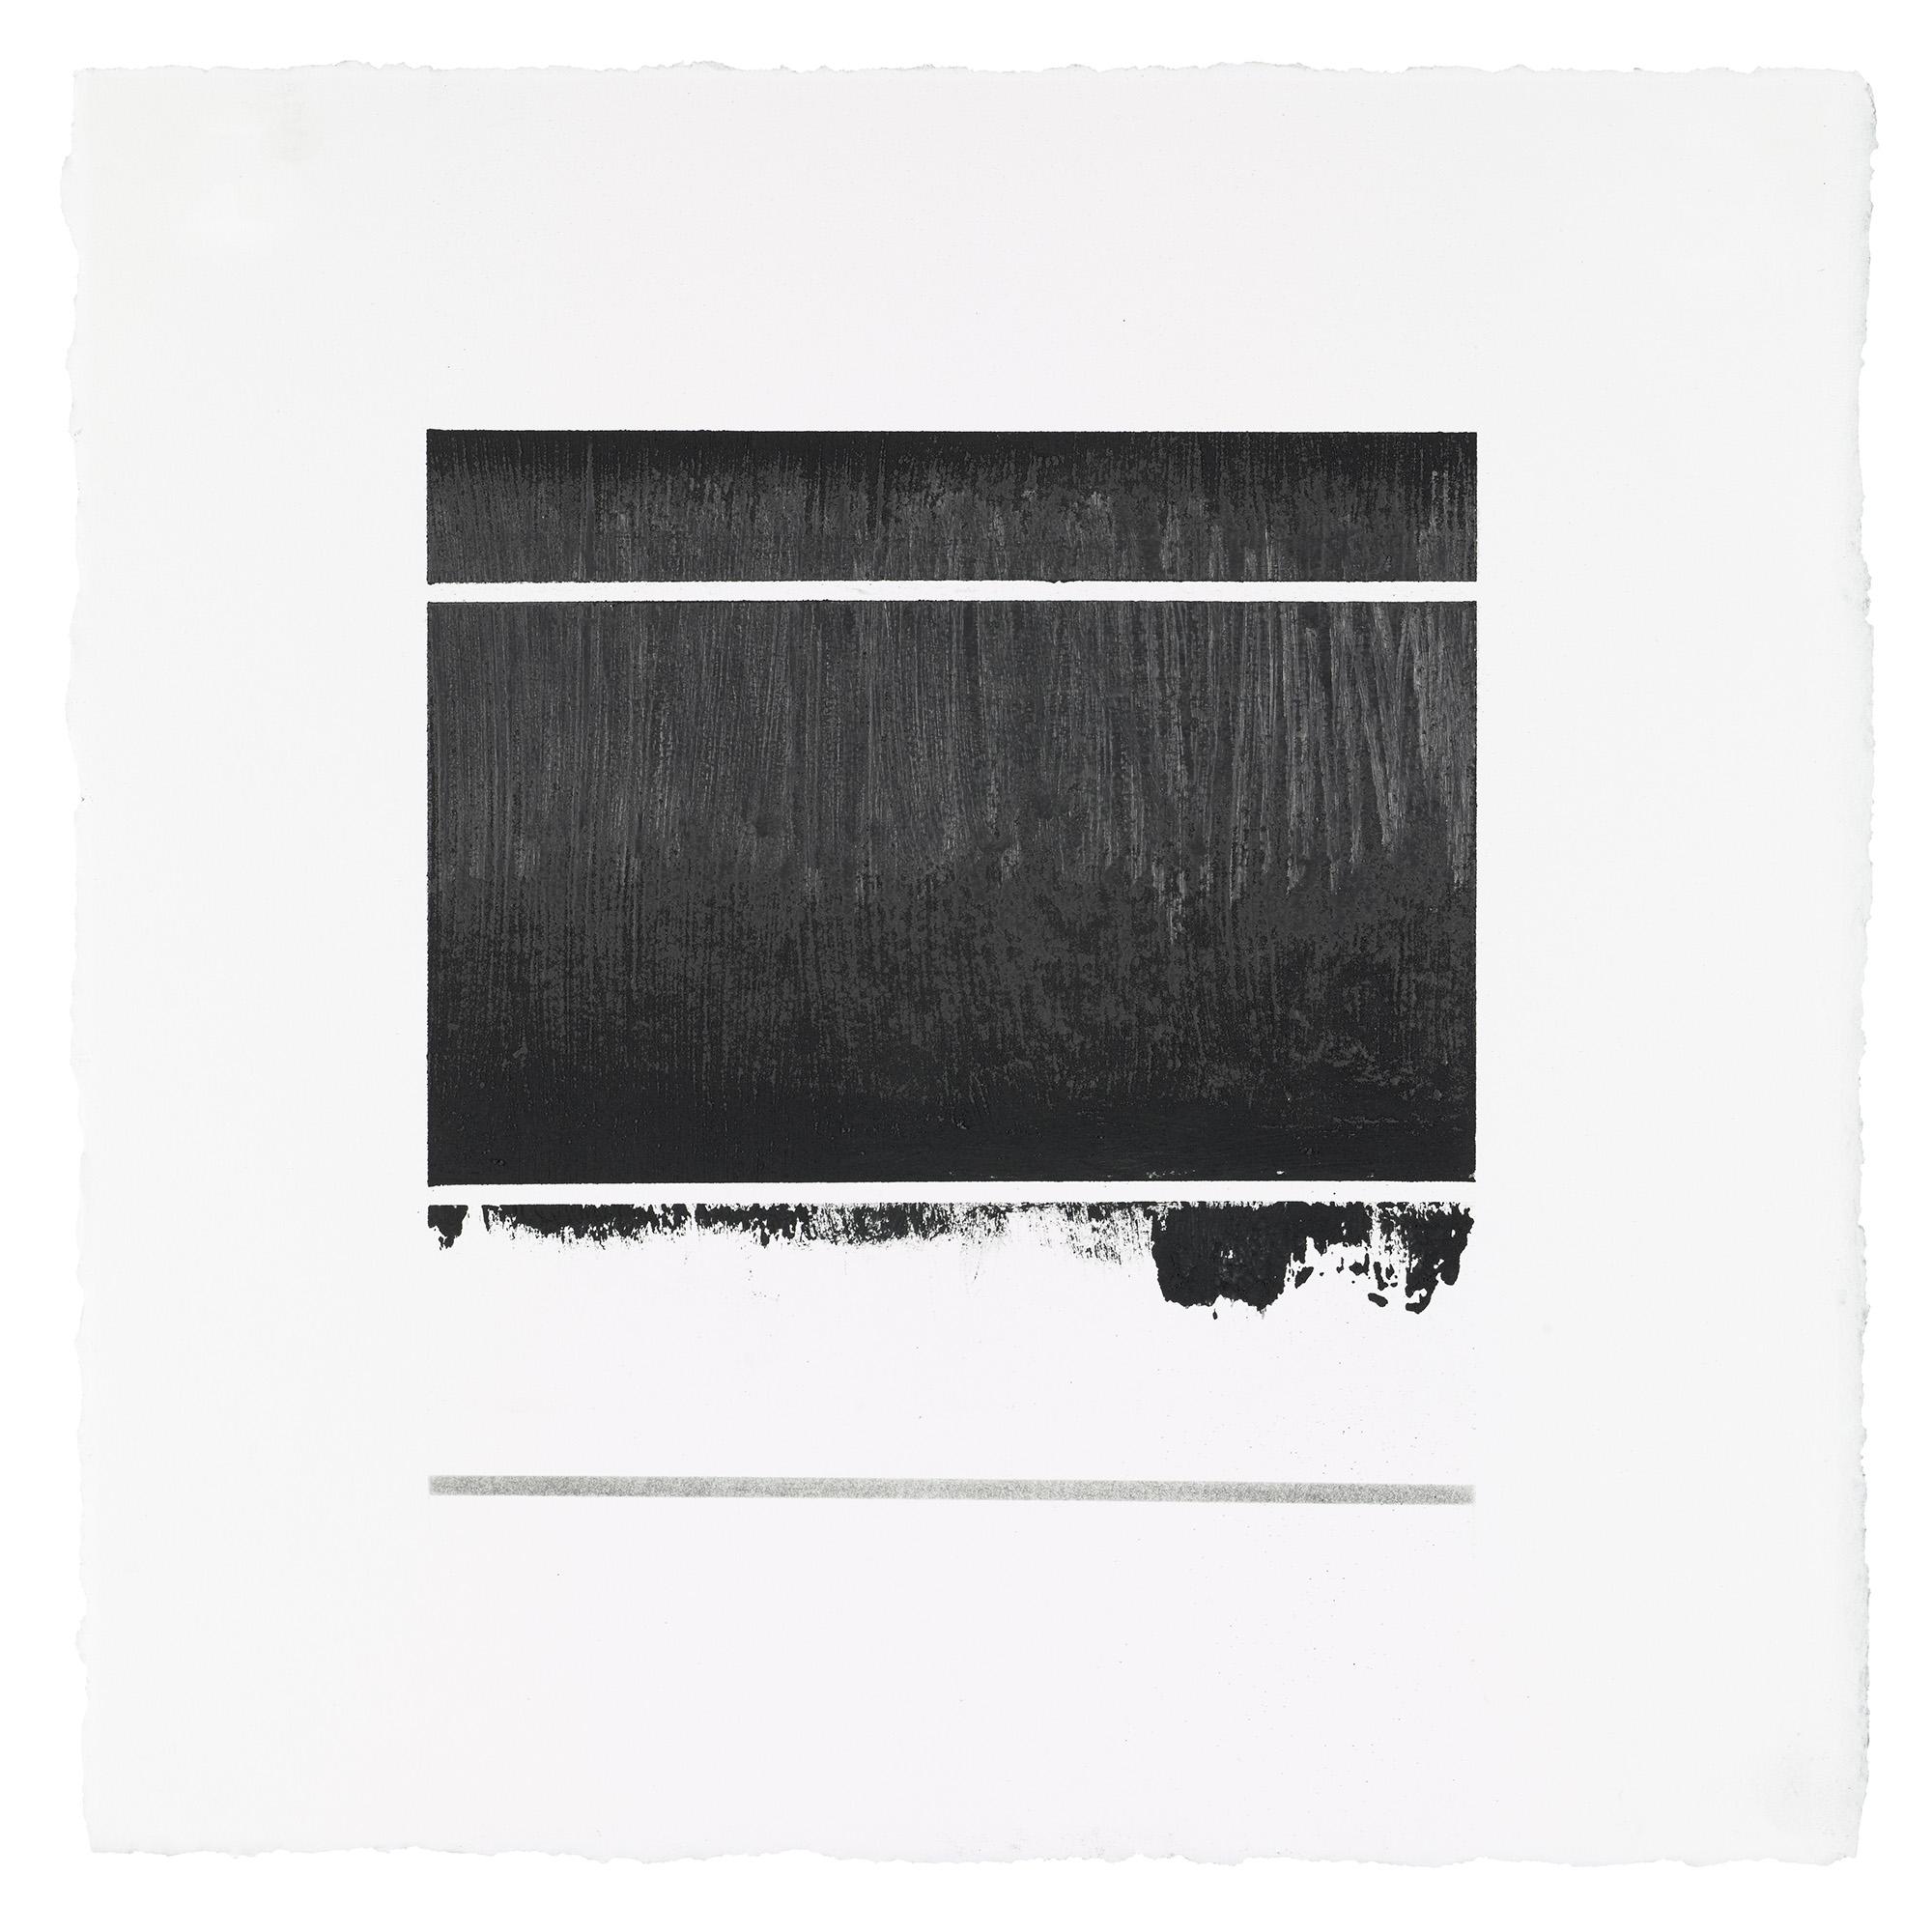 "ML67, peach pit soot, rabbit skin glue, graphite, 10.5""x10.5"", 2017"